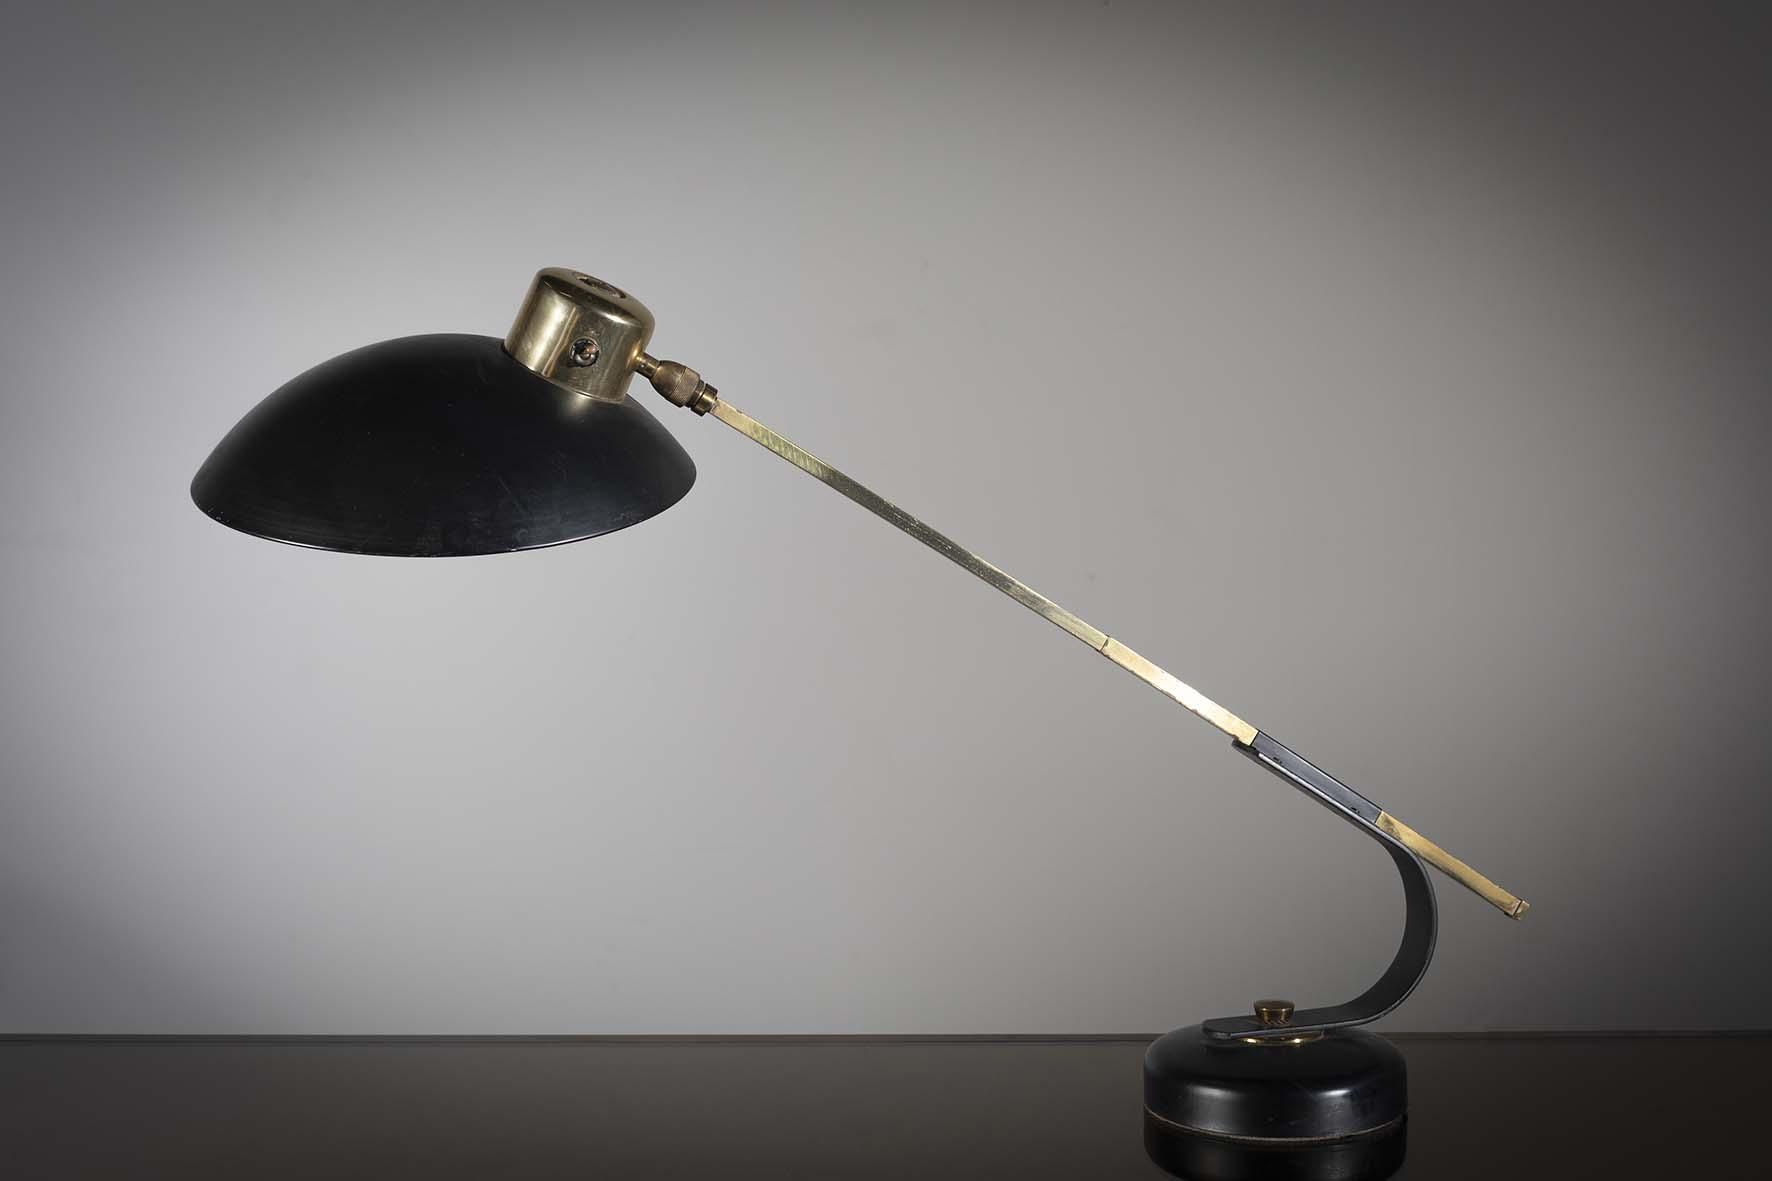 Lot 43 - 1960s DESK LAMP